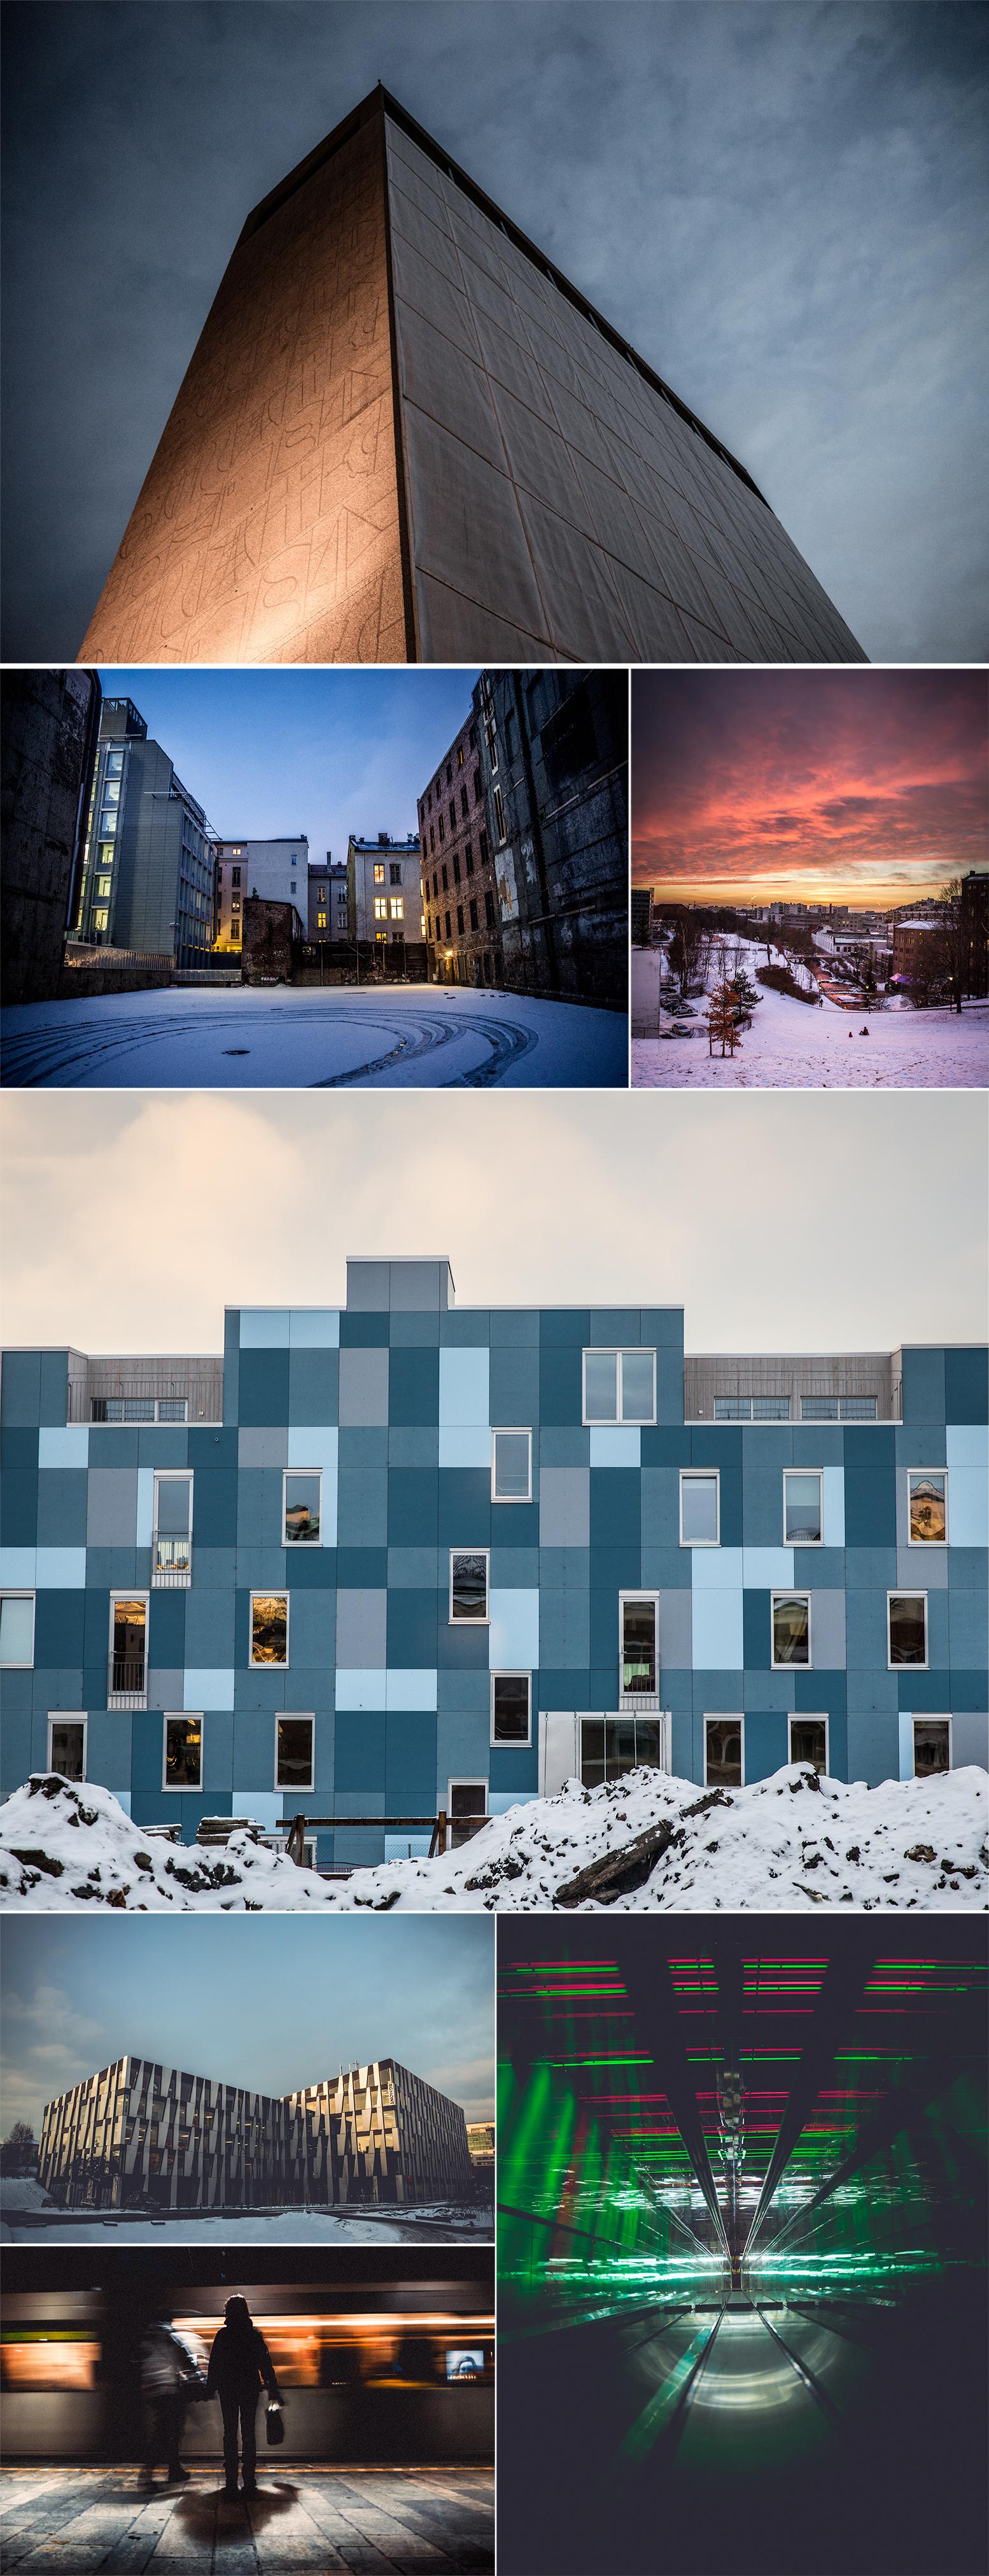 365 - 5 - the Government quarter, downtown Oslo, Grünerløkka, apartments Nydalen, Egmont Nydalen, Nydalen subway station